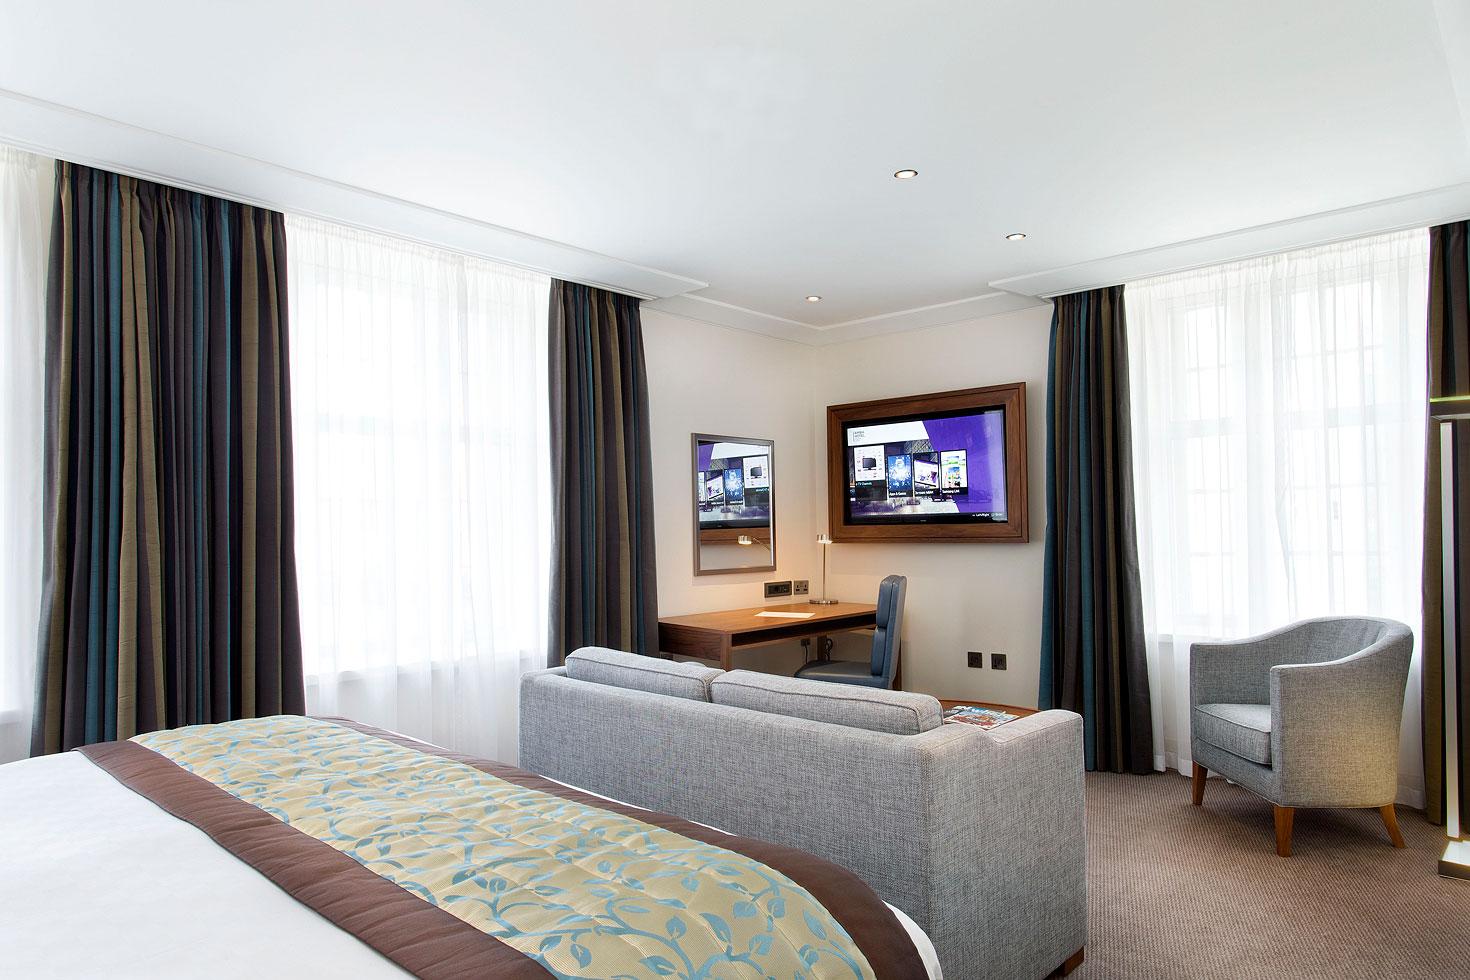 Charing Cross Bedroom